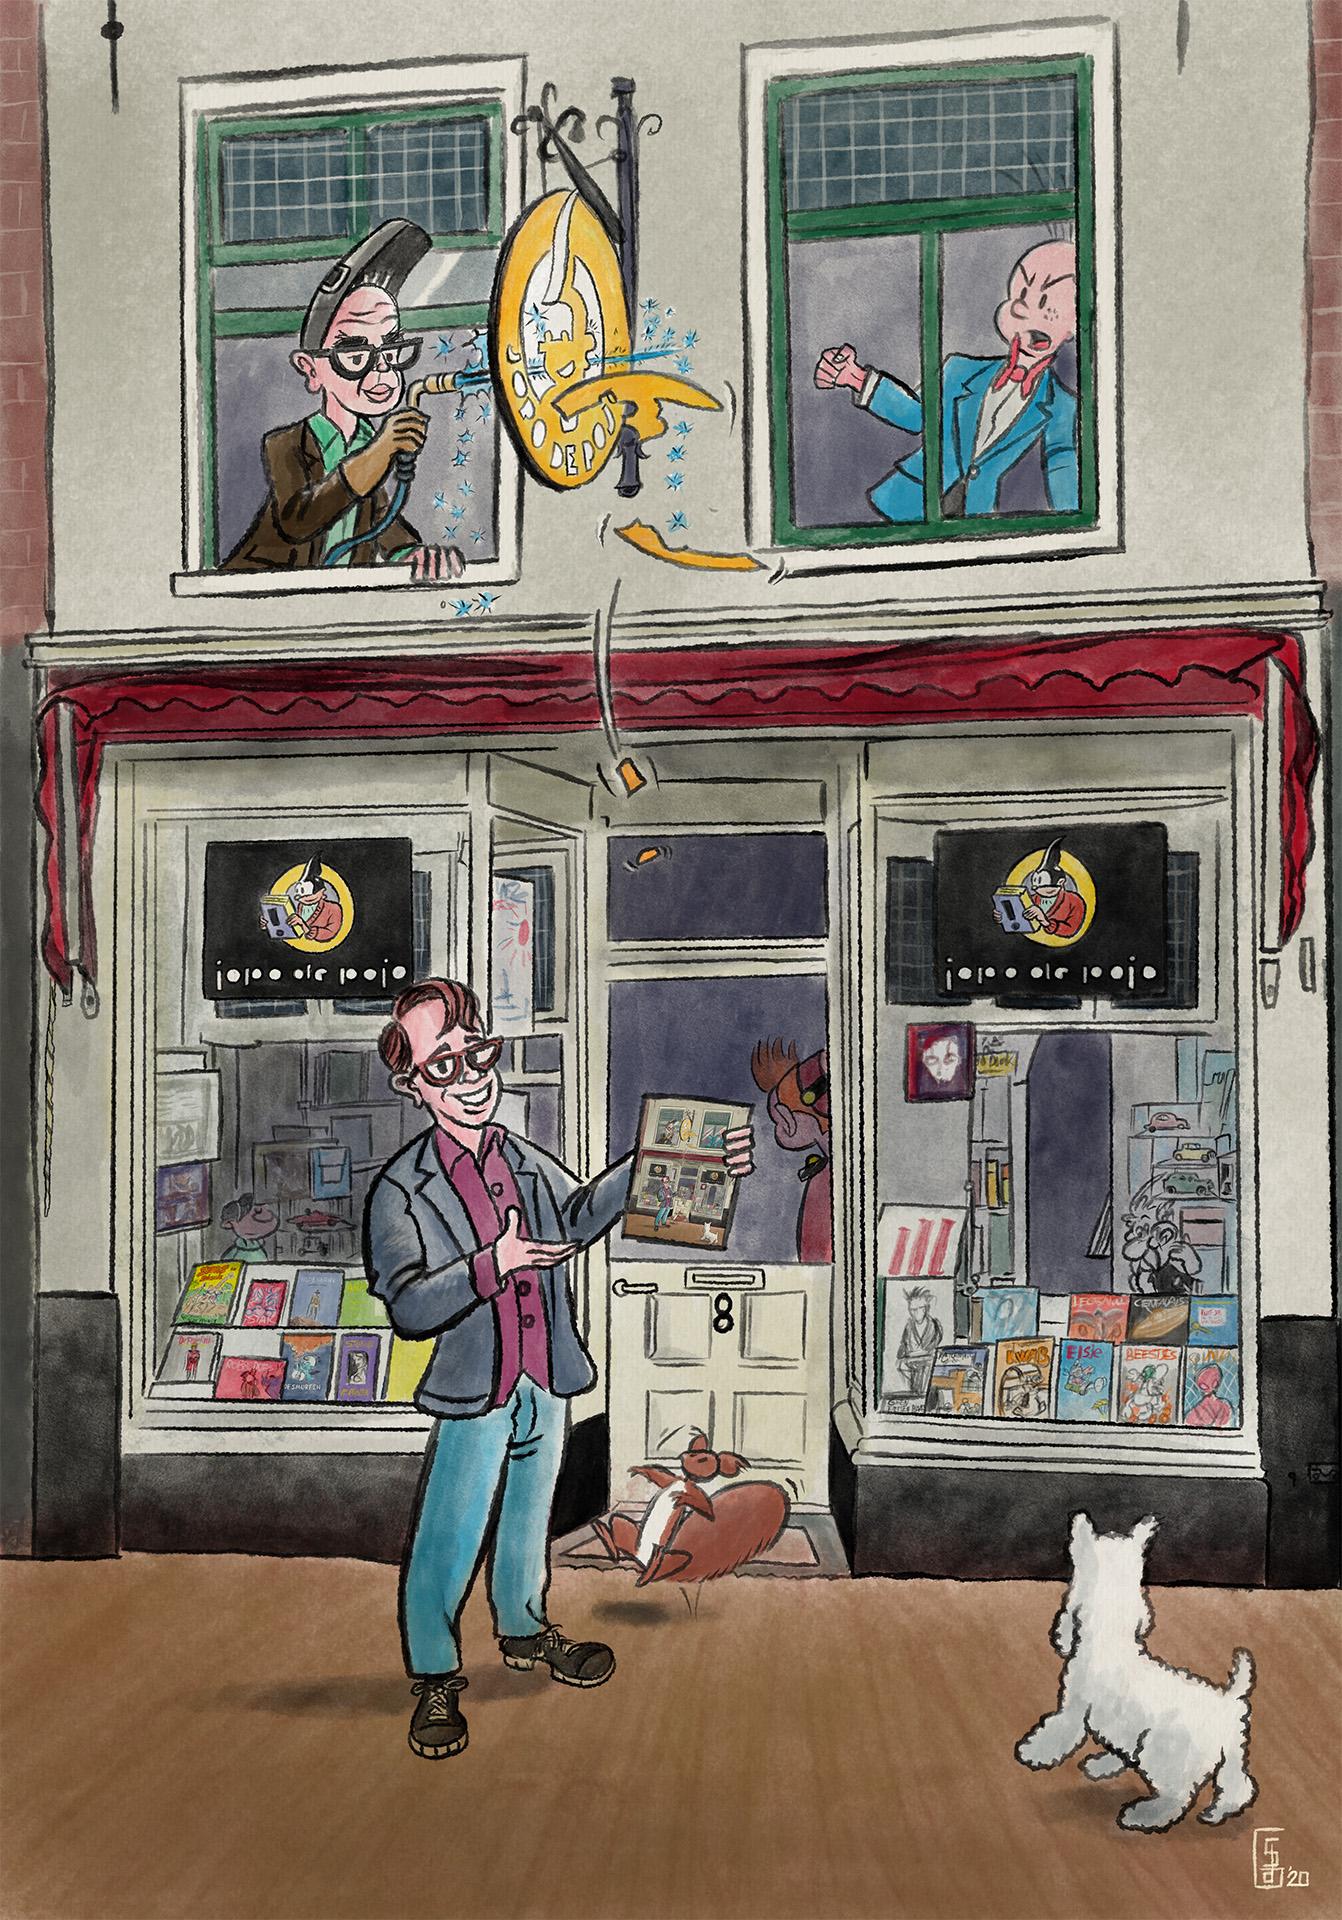 poster stripwinkel Jopo de Pojo door striptekenaar Stefan de Groot